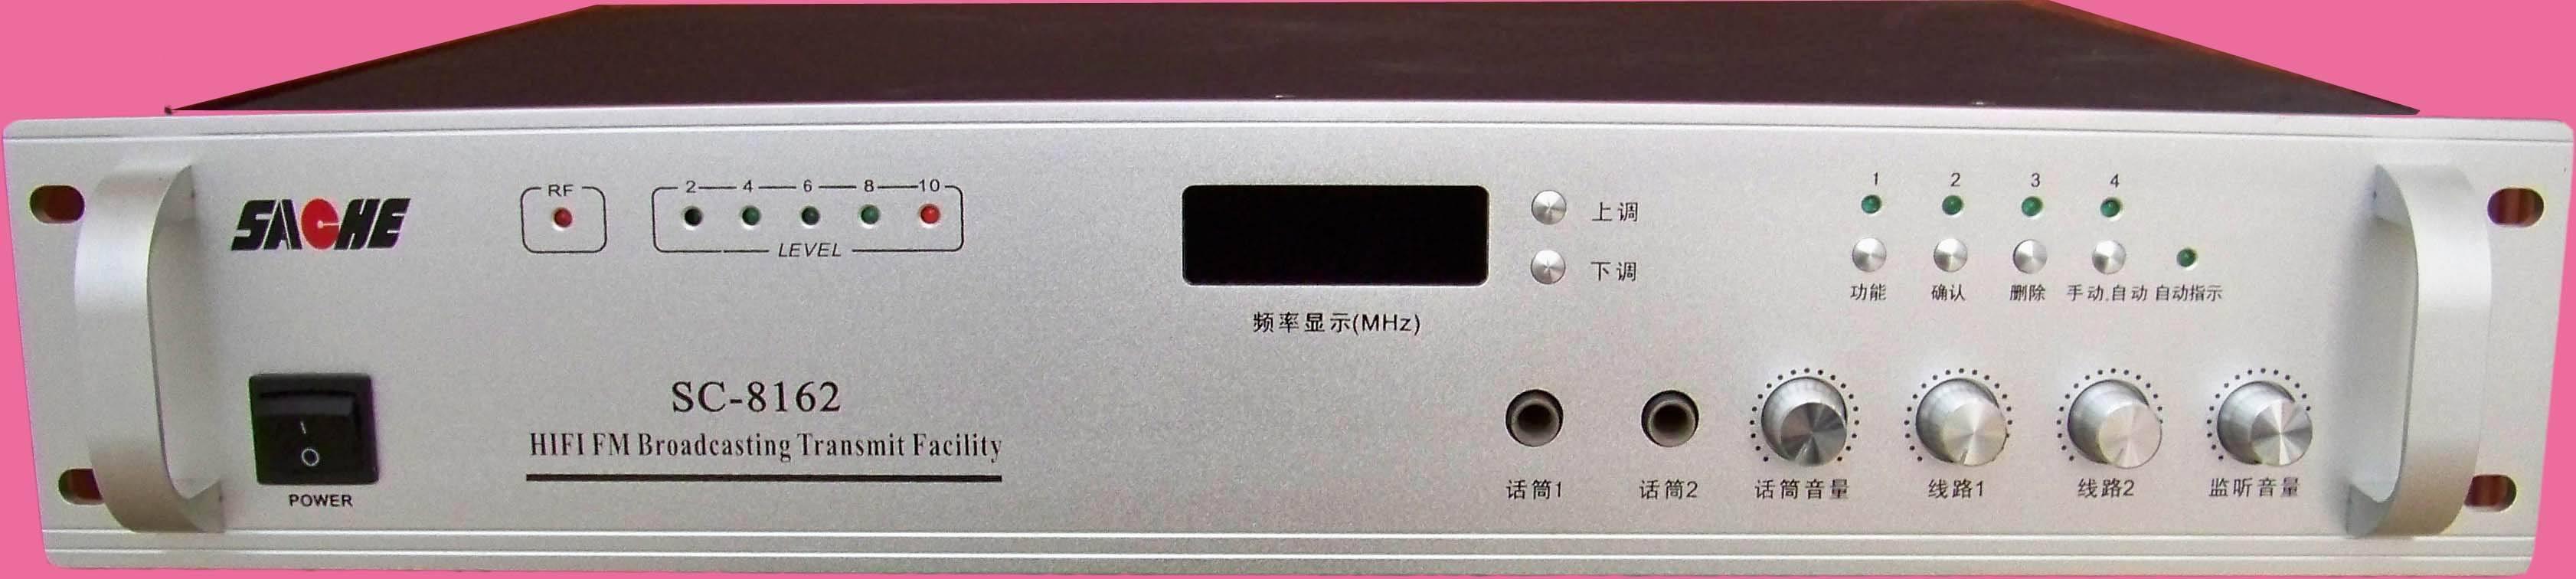 20-watt FM transmitter onboard transmitter broadcasting campus public address system equipment(China (Mainland))